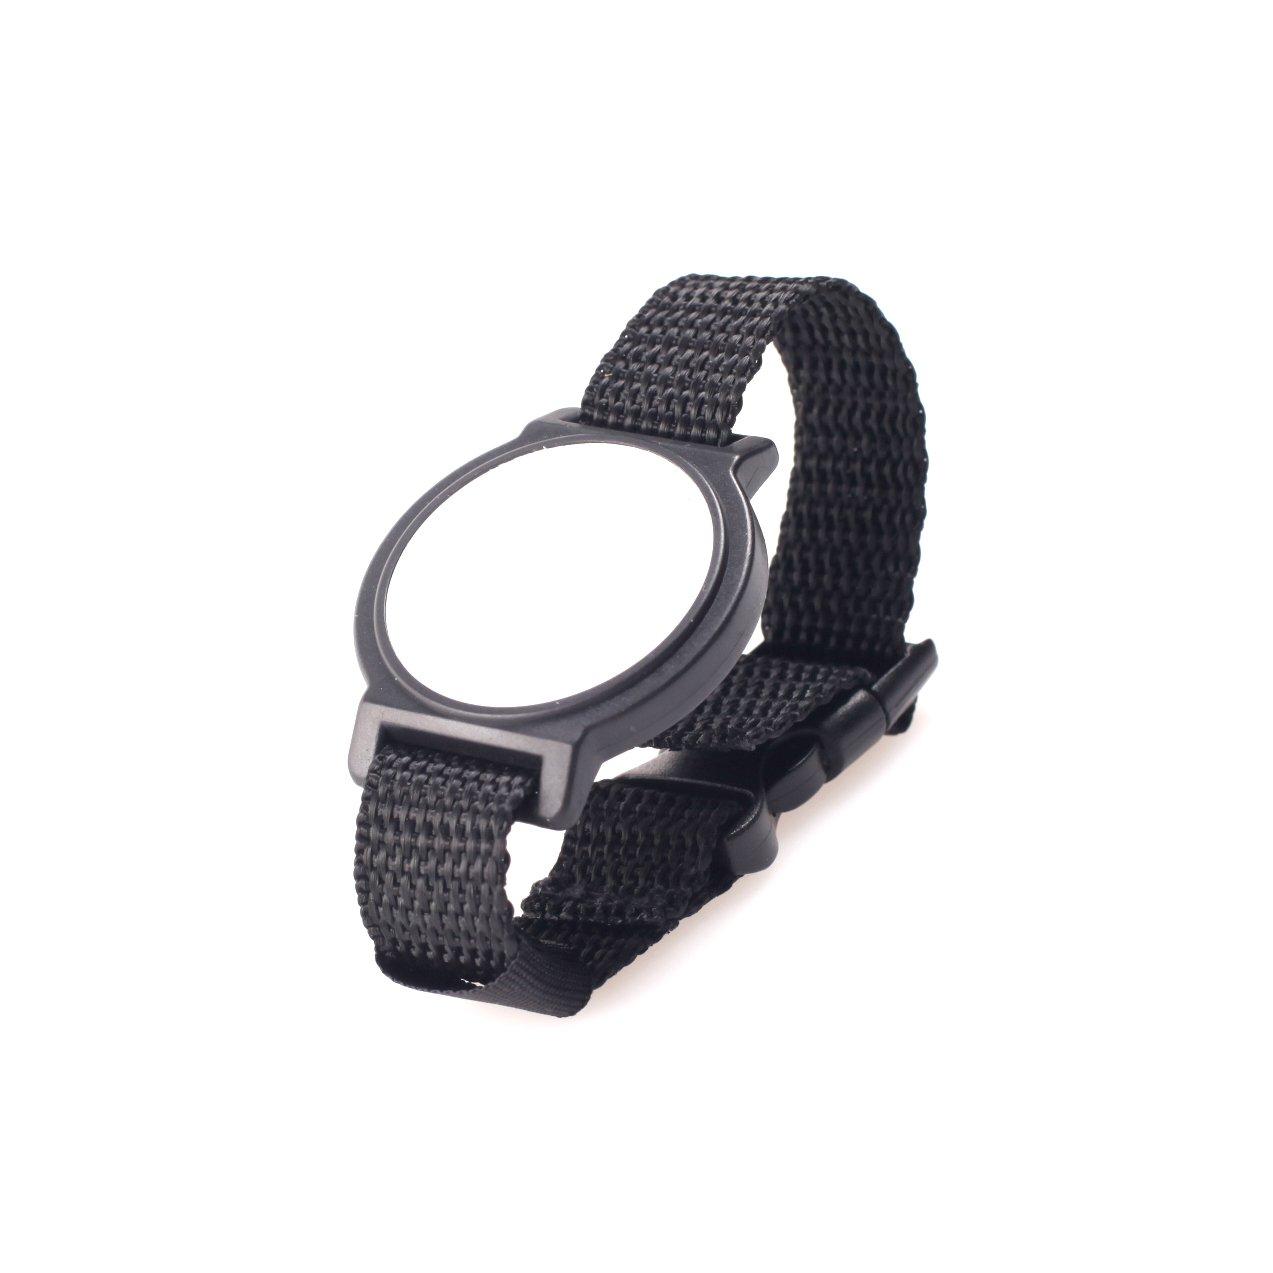 YARONGTECH-13.56MHZ MIFARE Classic 1K Waterproof ISO 14443A adjustable rfid nylon wristband -10pcs